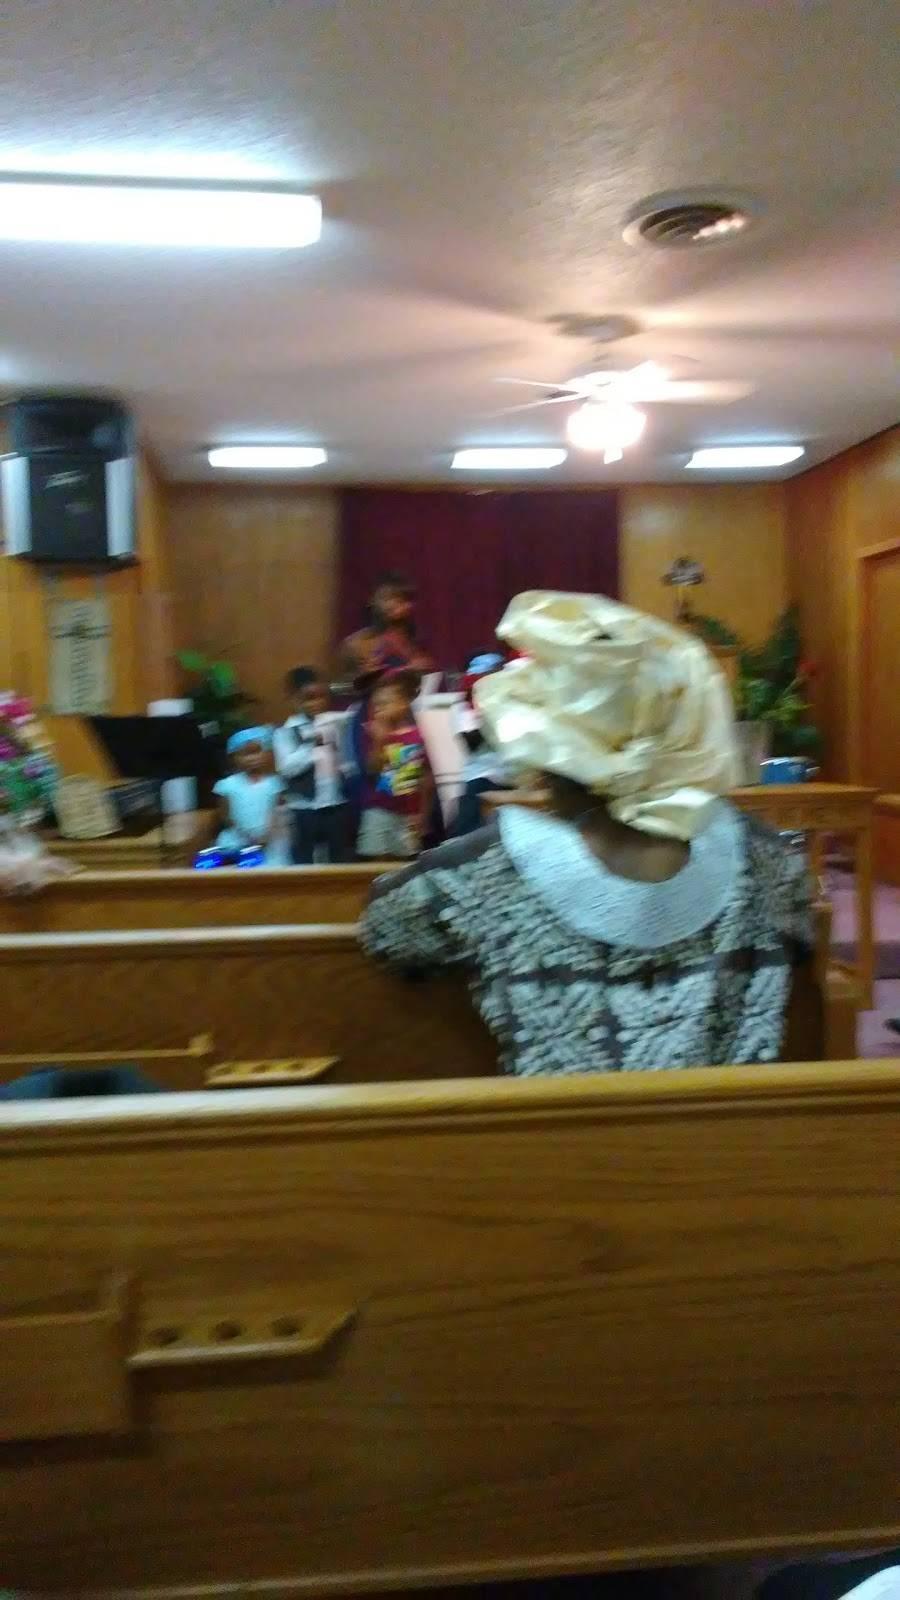 Westside Victory Baptist Church - church  | Photo 1 of 2 | Address: Fort Worth, TX 76114, USA | Phone: (817) 738-4976